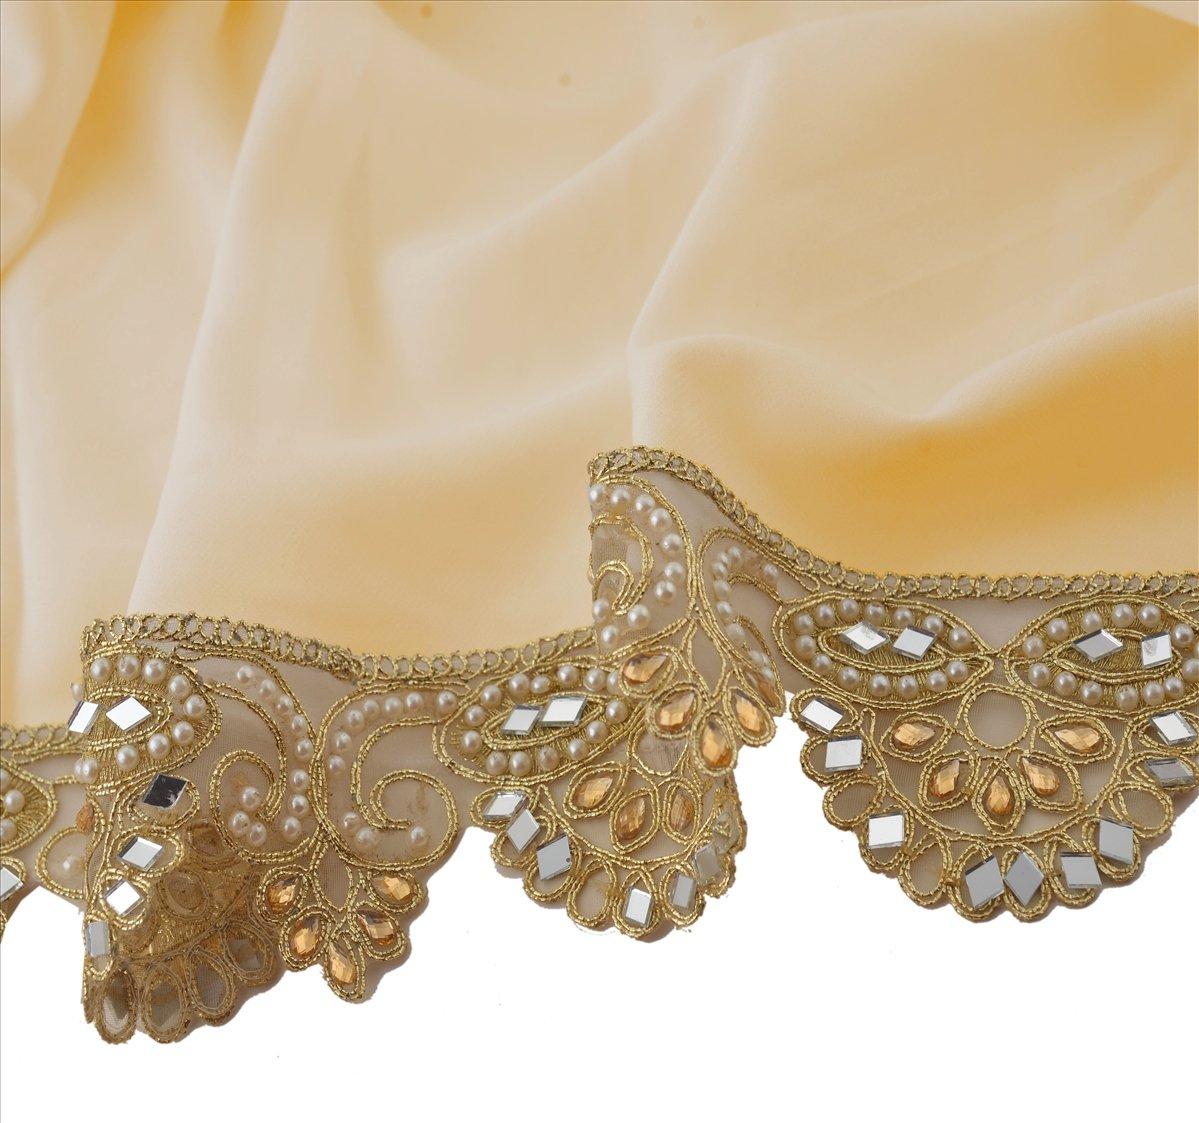 BridalMary Hand Beaded Bridal Dress DIY Wedding Sash Applique 1 YD Golden Craft Lace.